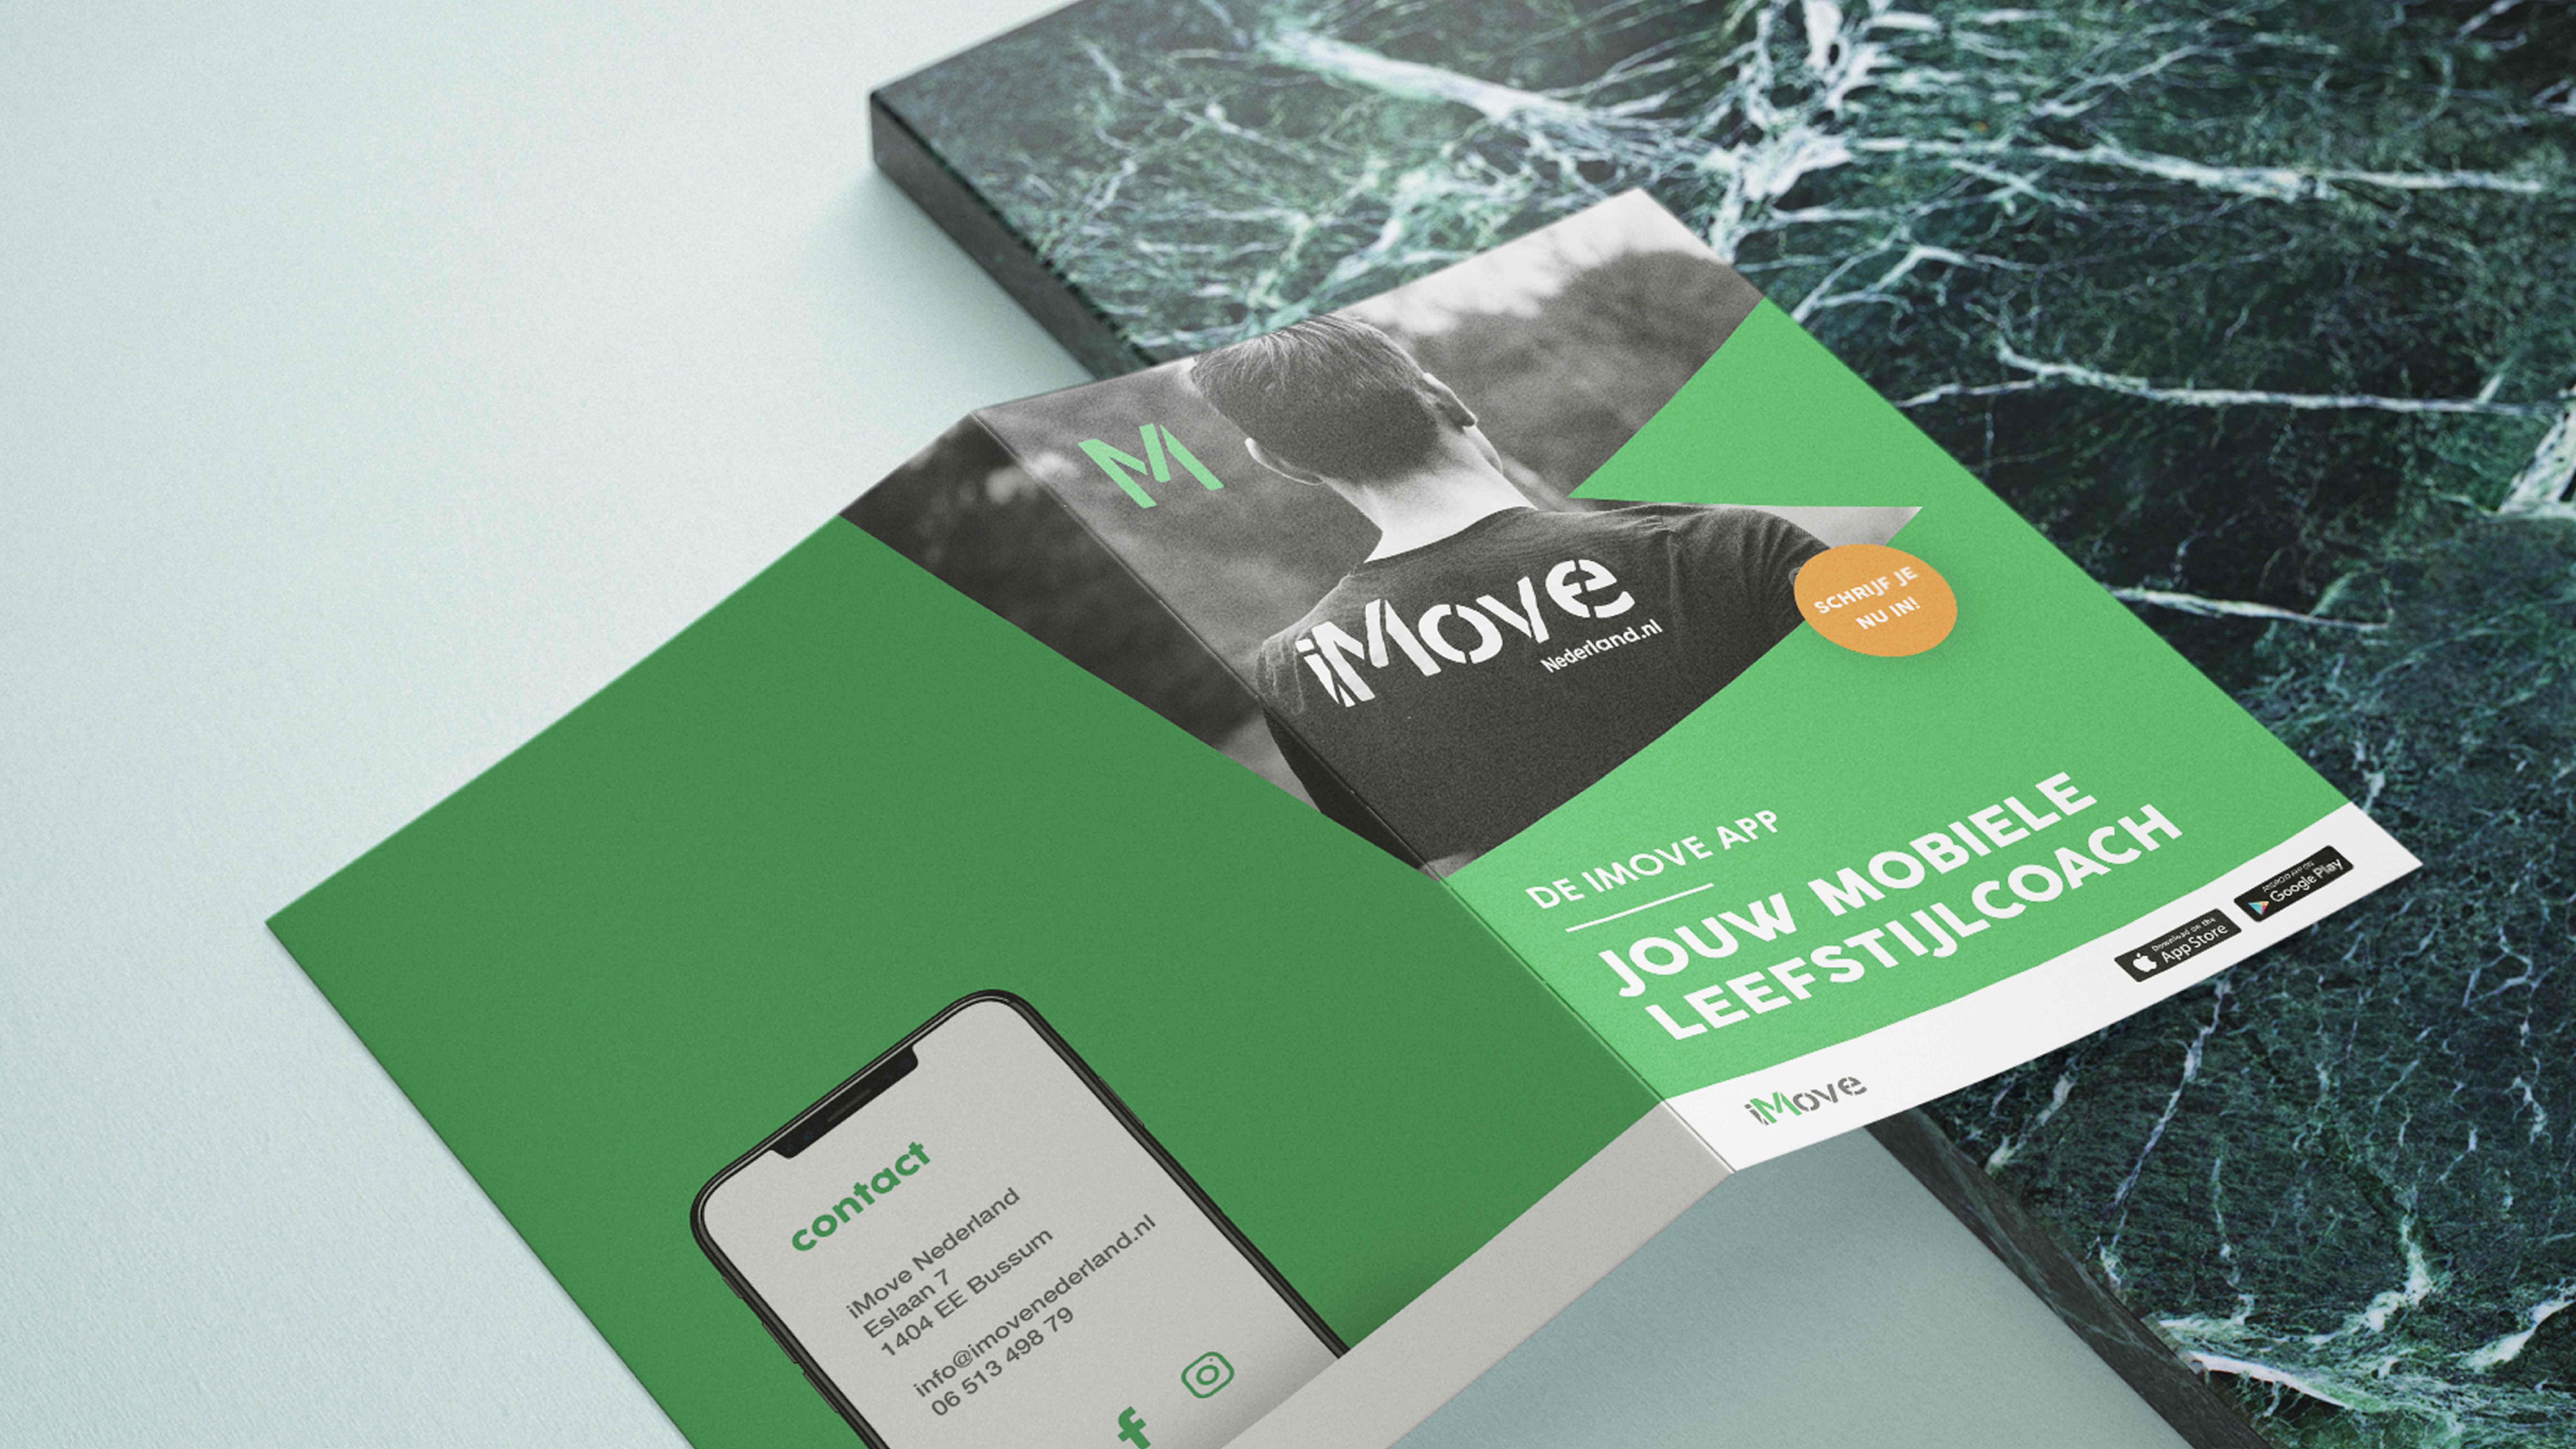 Imove-Nederland-branding-Studio-sont